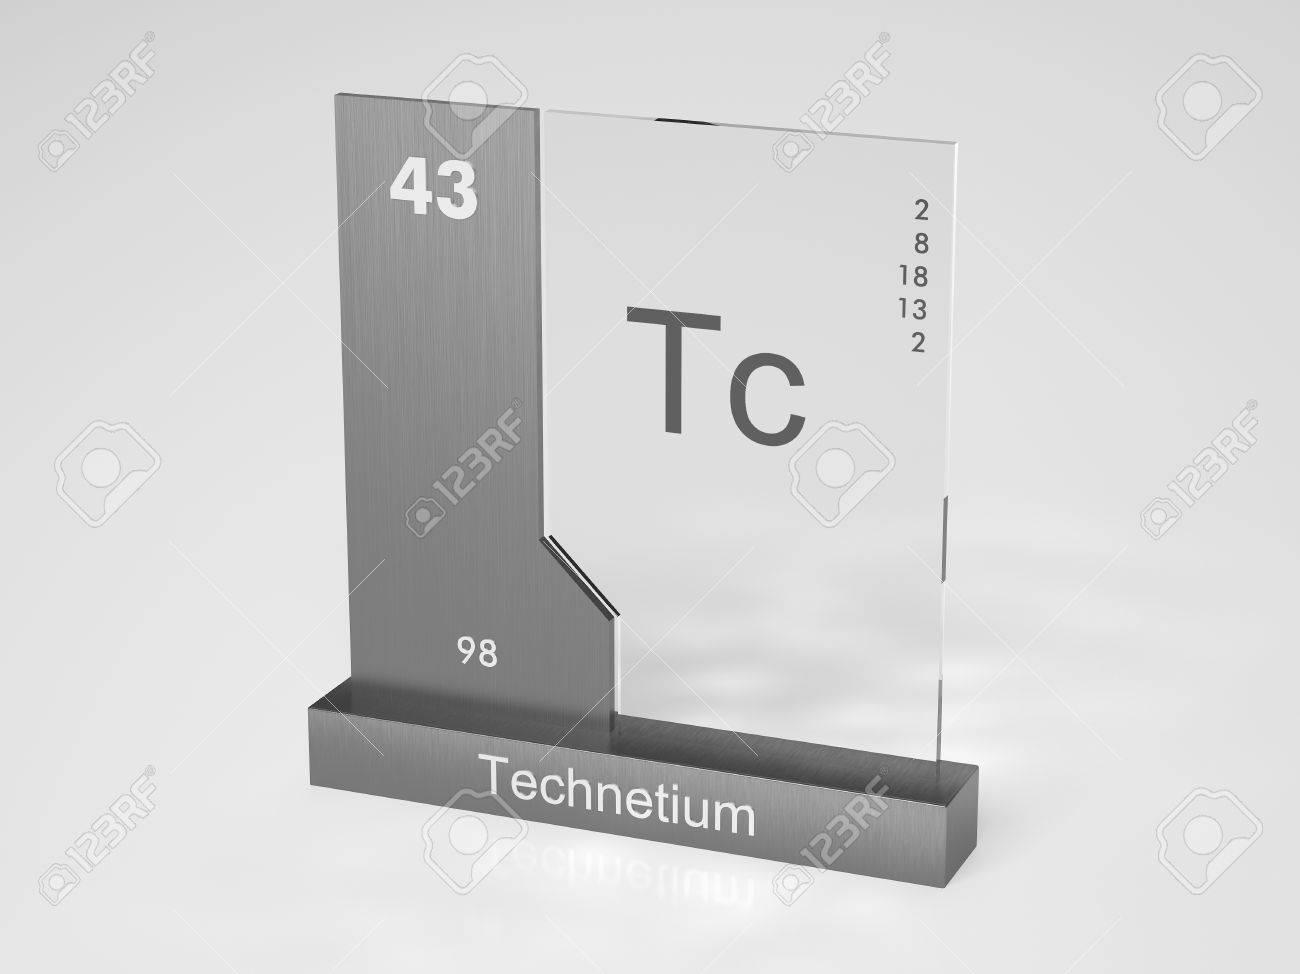 Technetium symbol tc chemical element of the periodic table stock photo technetium symbol tc chemical element of the periodic table urtaz Images